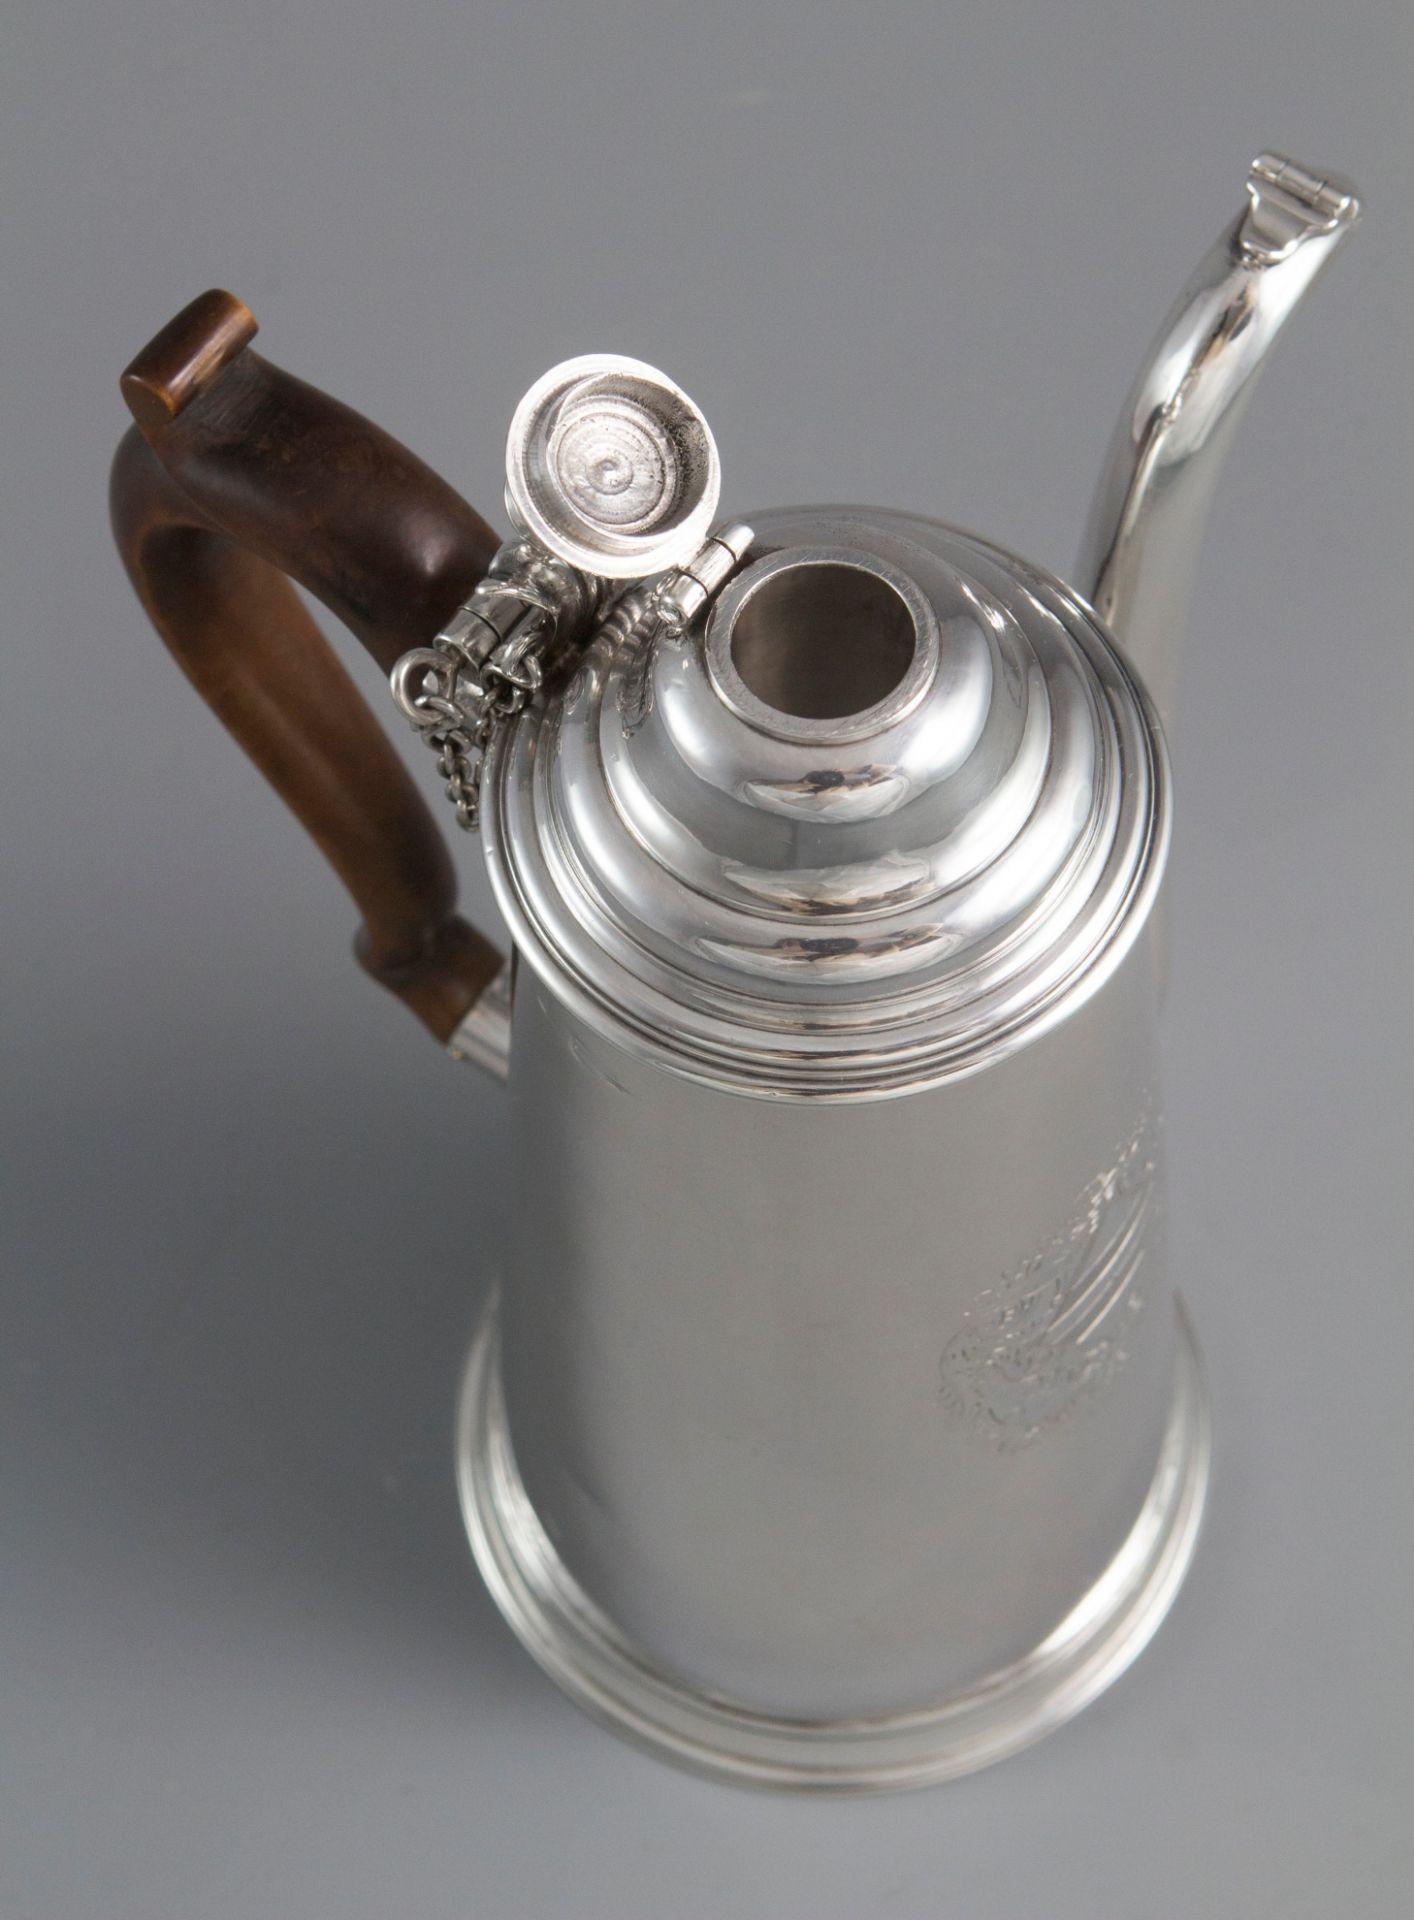 A Rare and Important William III Britannia Silver Chocolate Pot London 1698